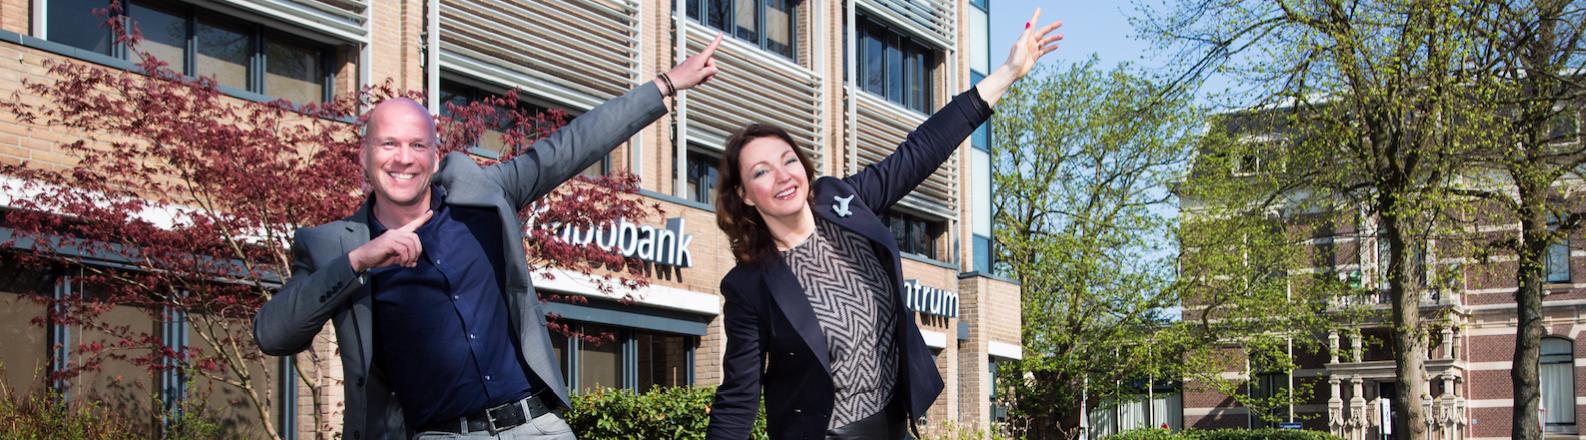 Rabobank Haarlem partner Olympische Dag Haarlem 2018